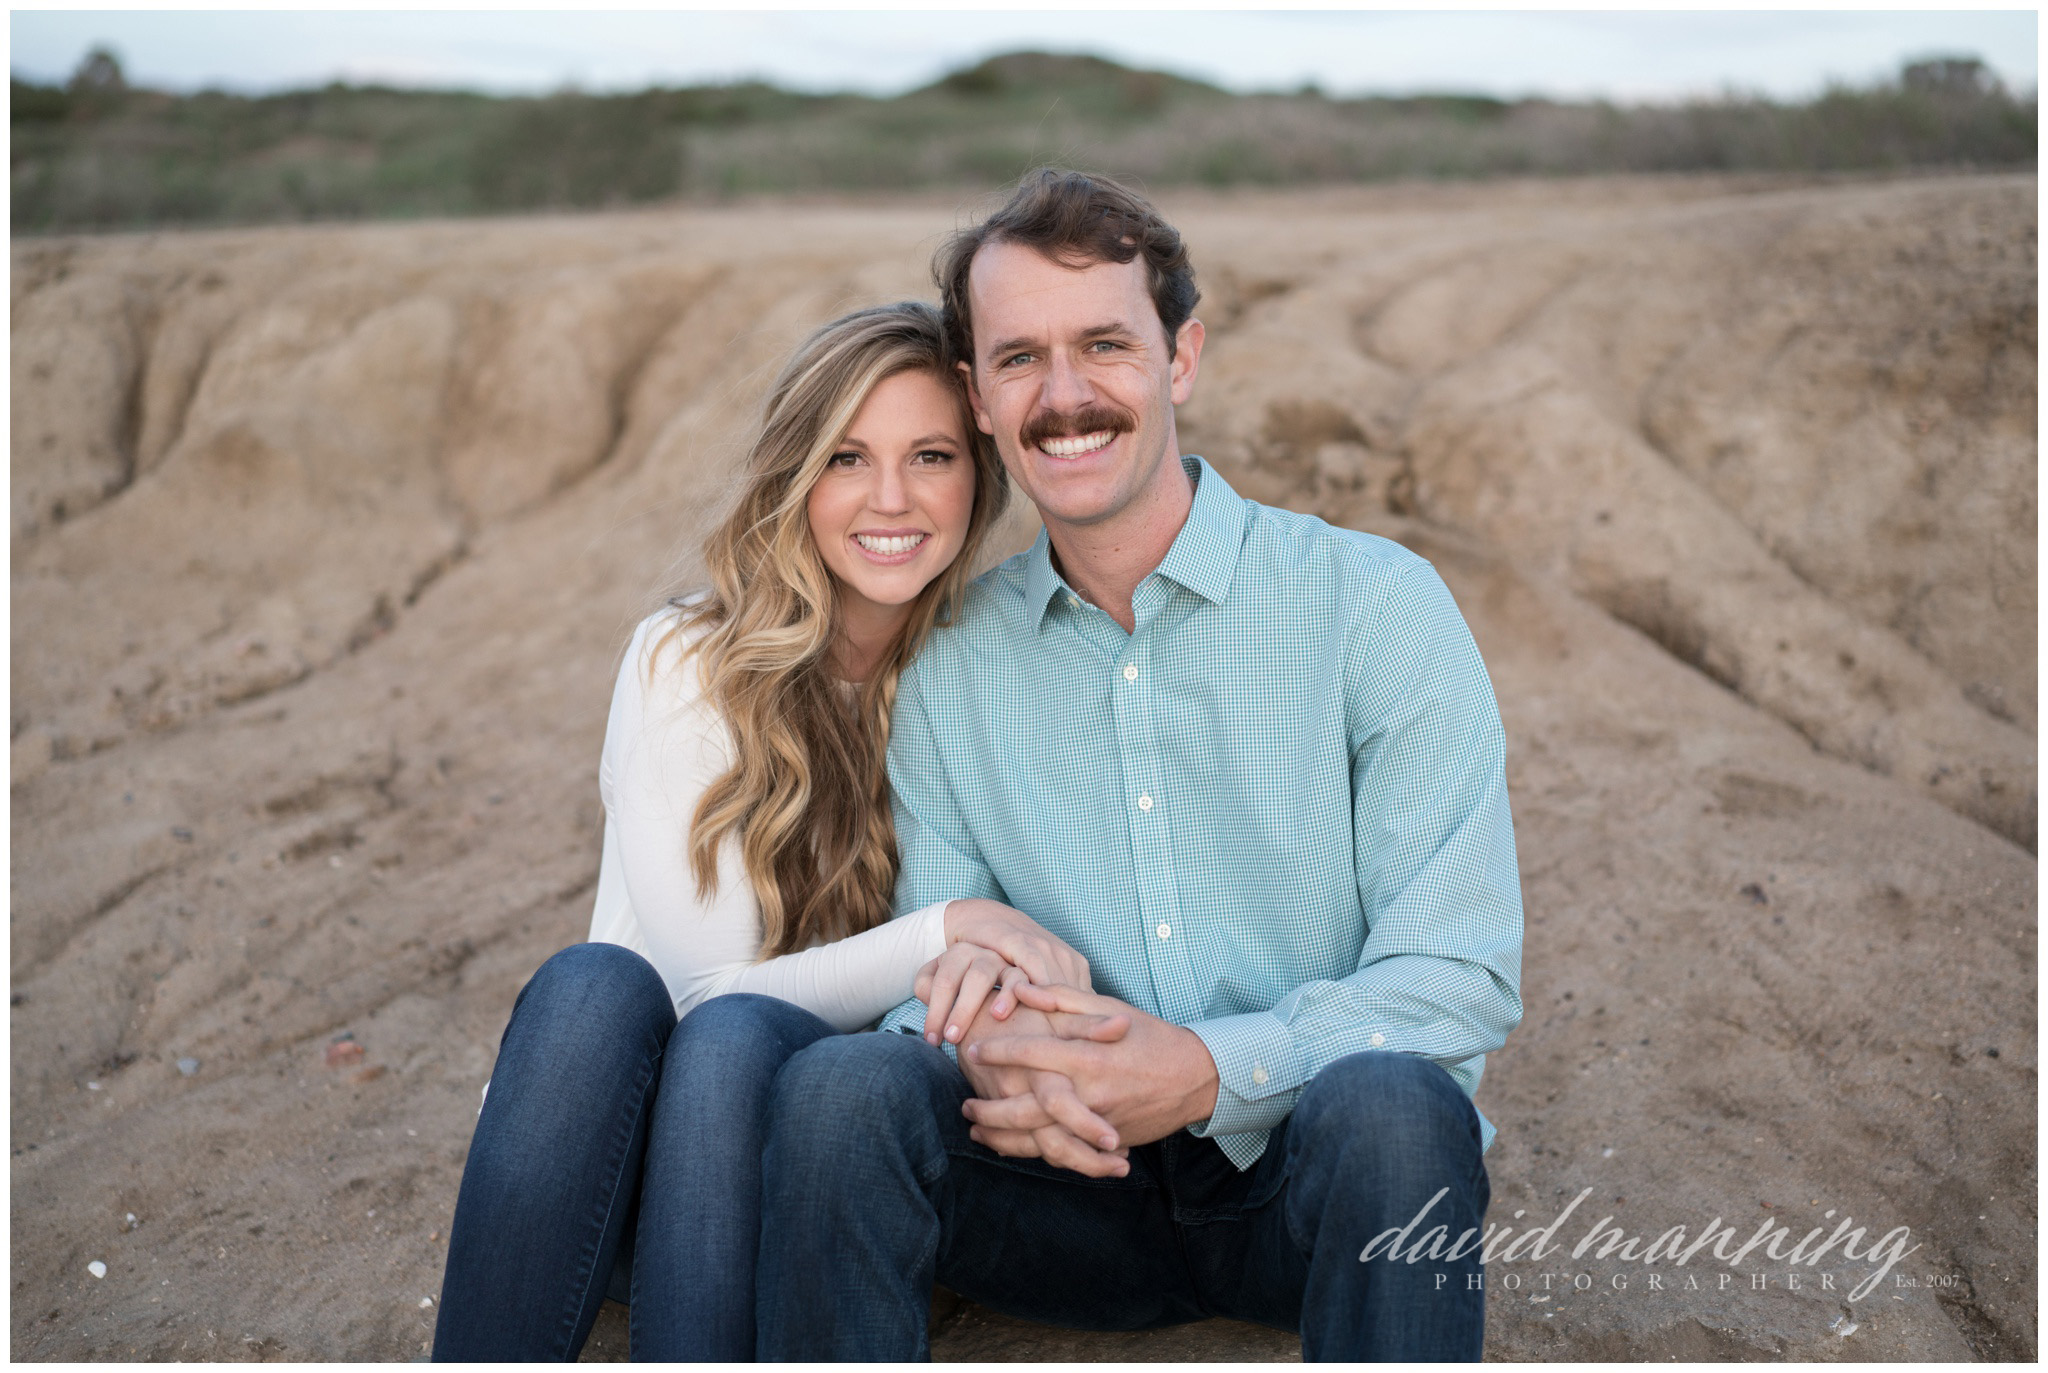 Alyssa-Taylor-Engagement-David-Manning-Photographer-0156.JPG